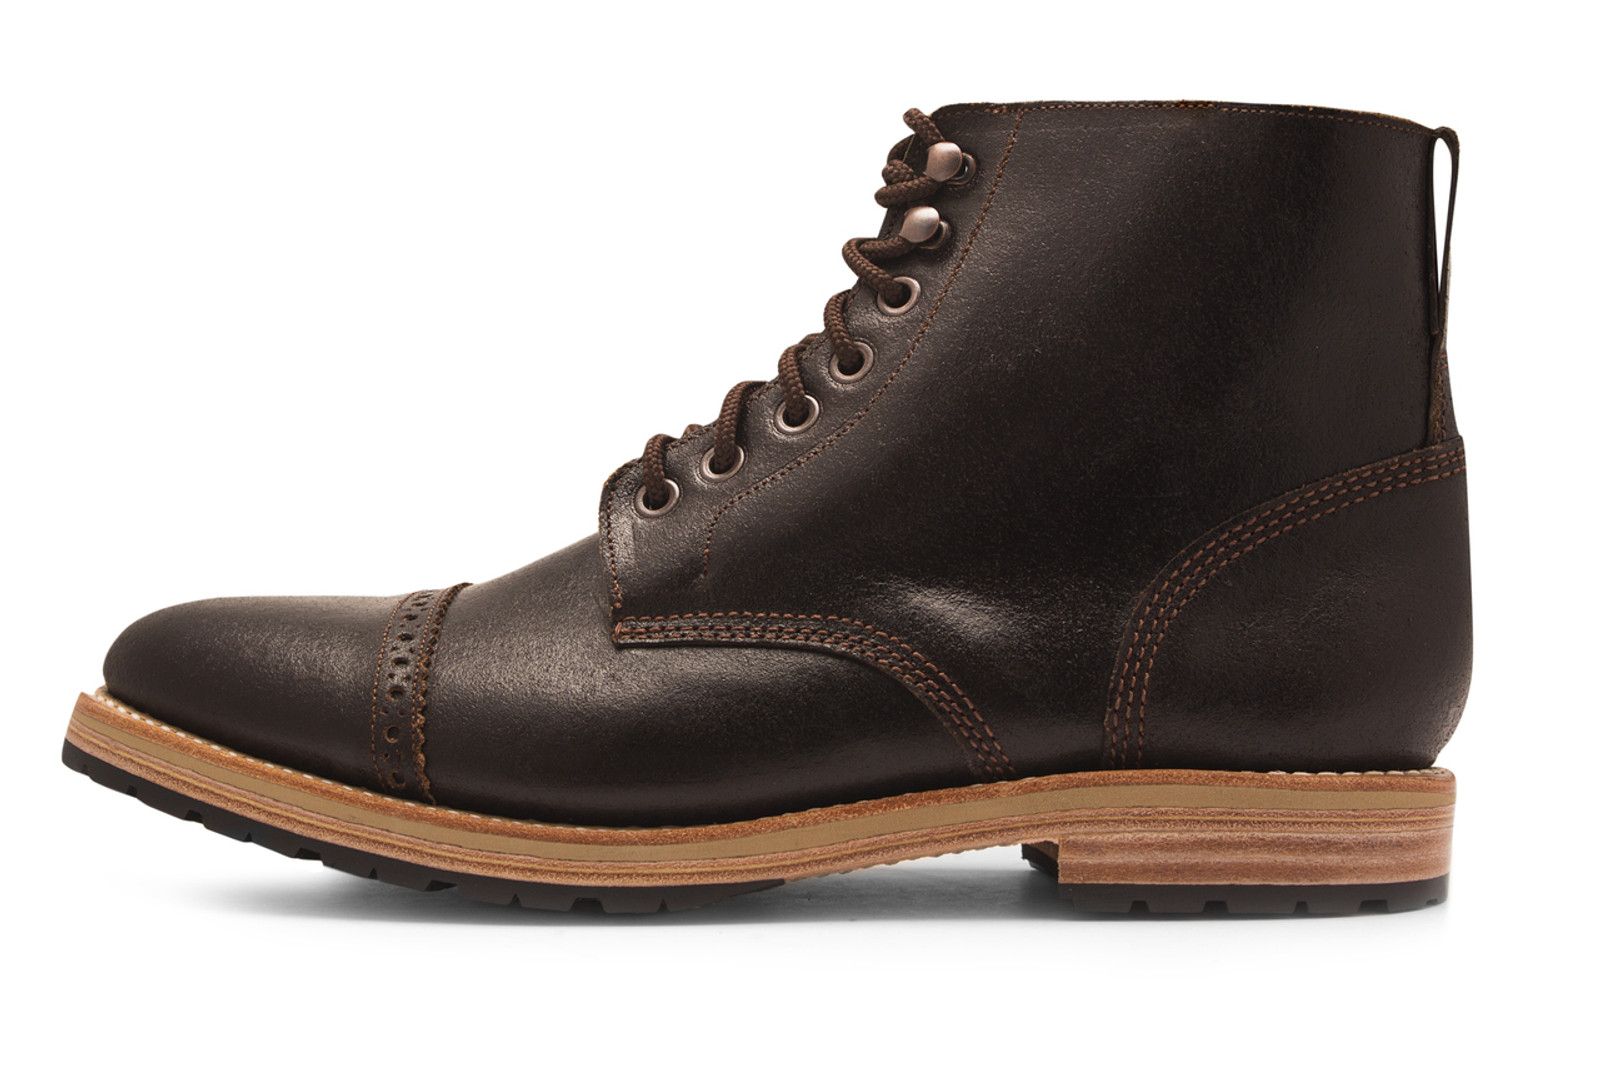 BROWN WAXED FLESH FOOTWEAR